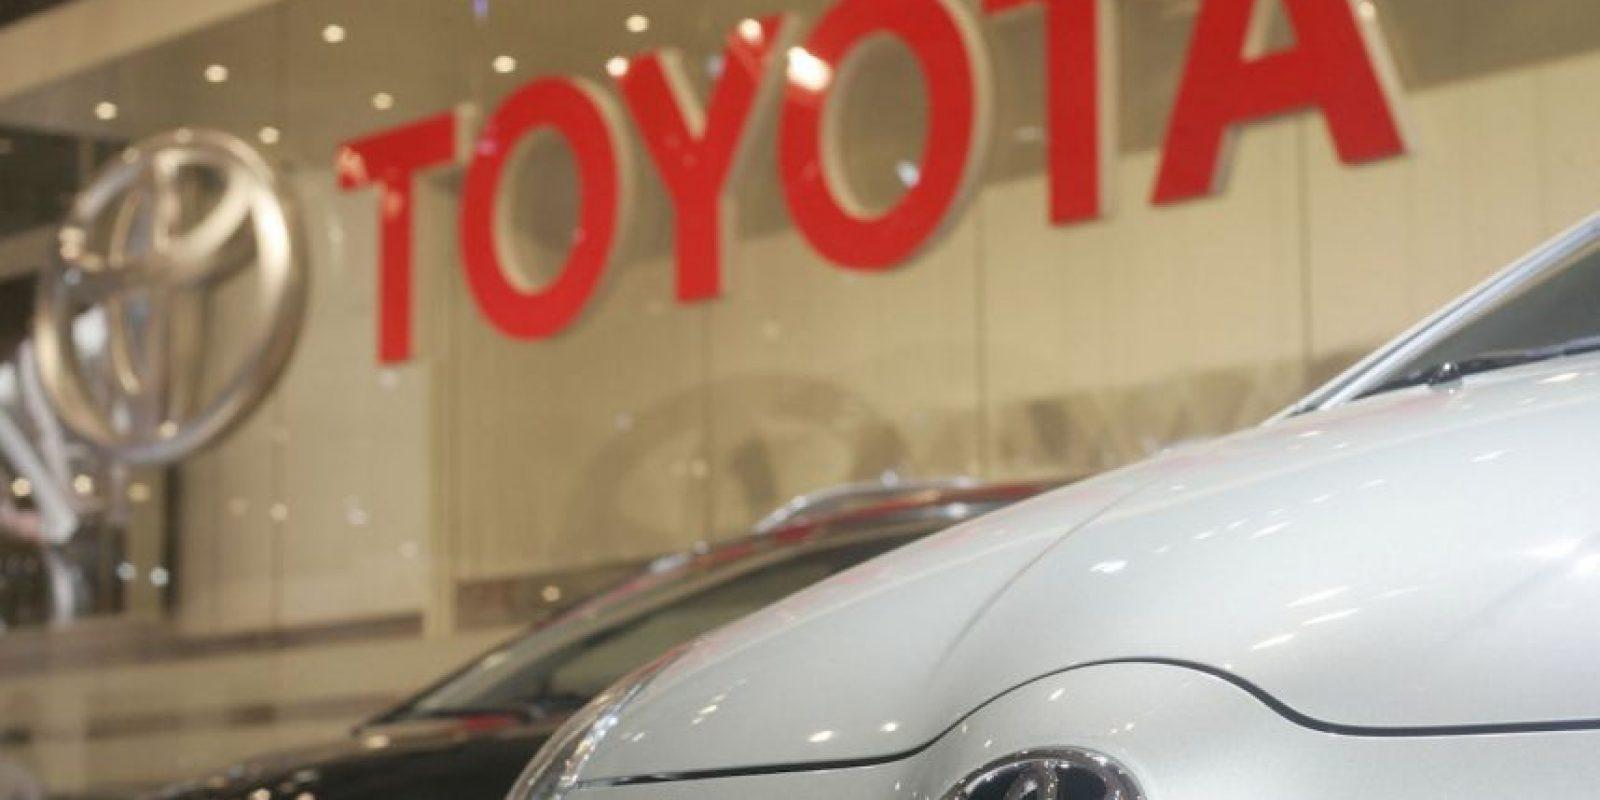 9) Toyota 31 mil 300 millones de dólares Foto:Getty Images